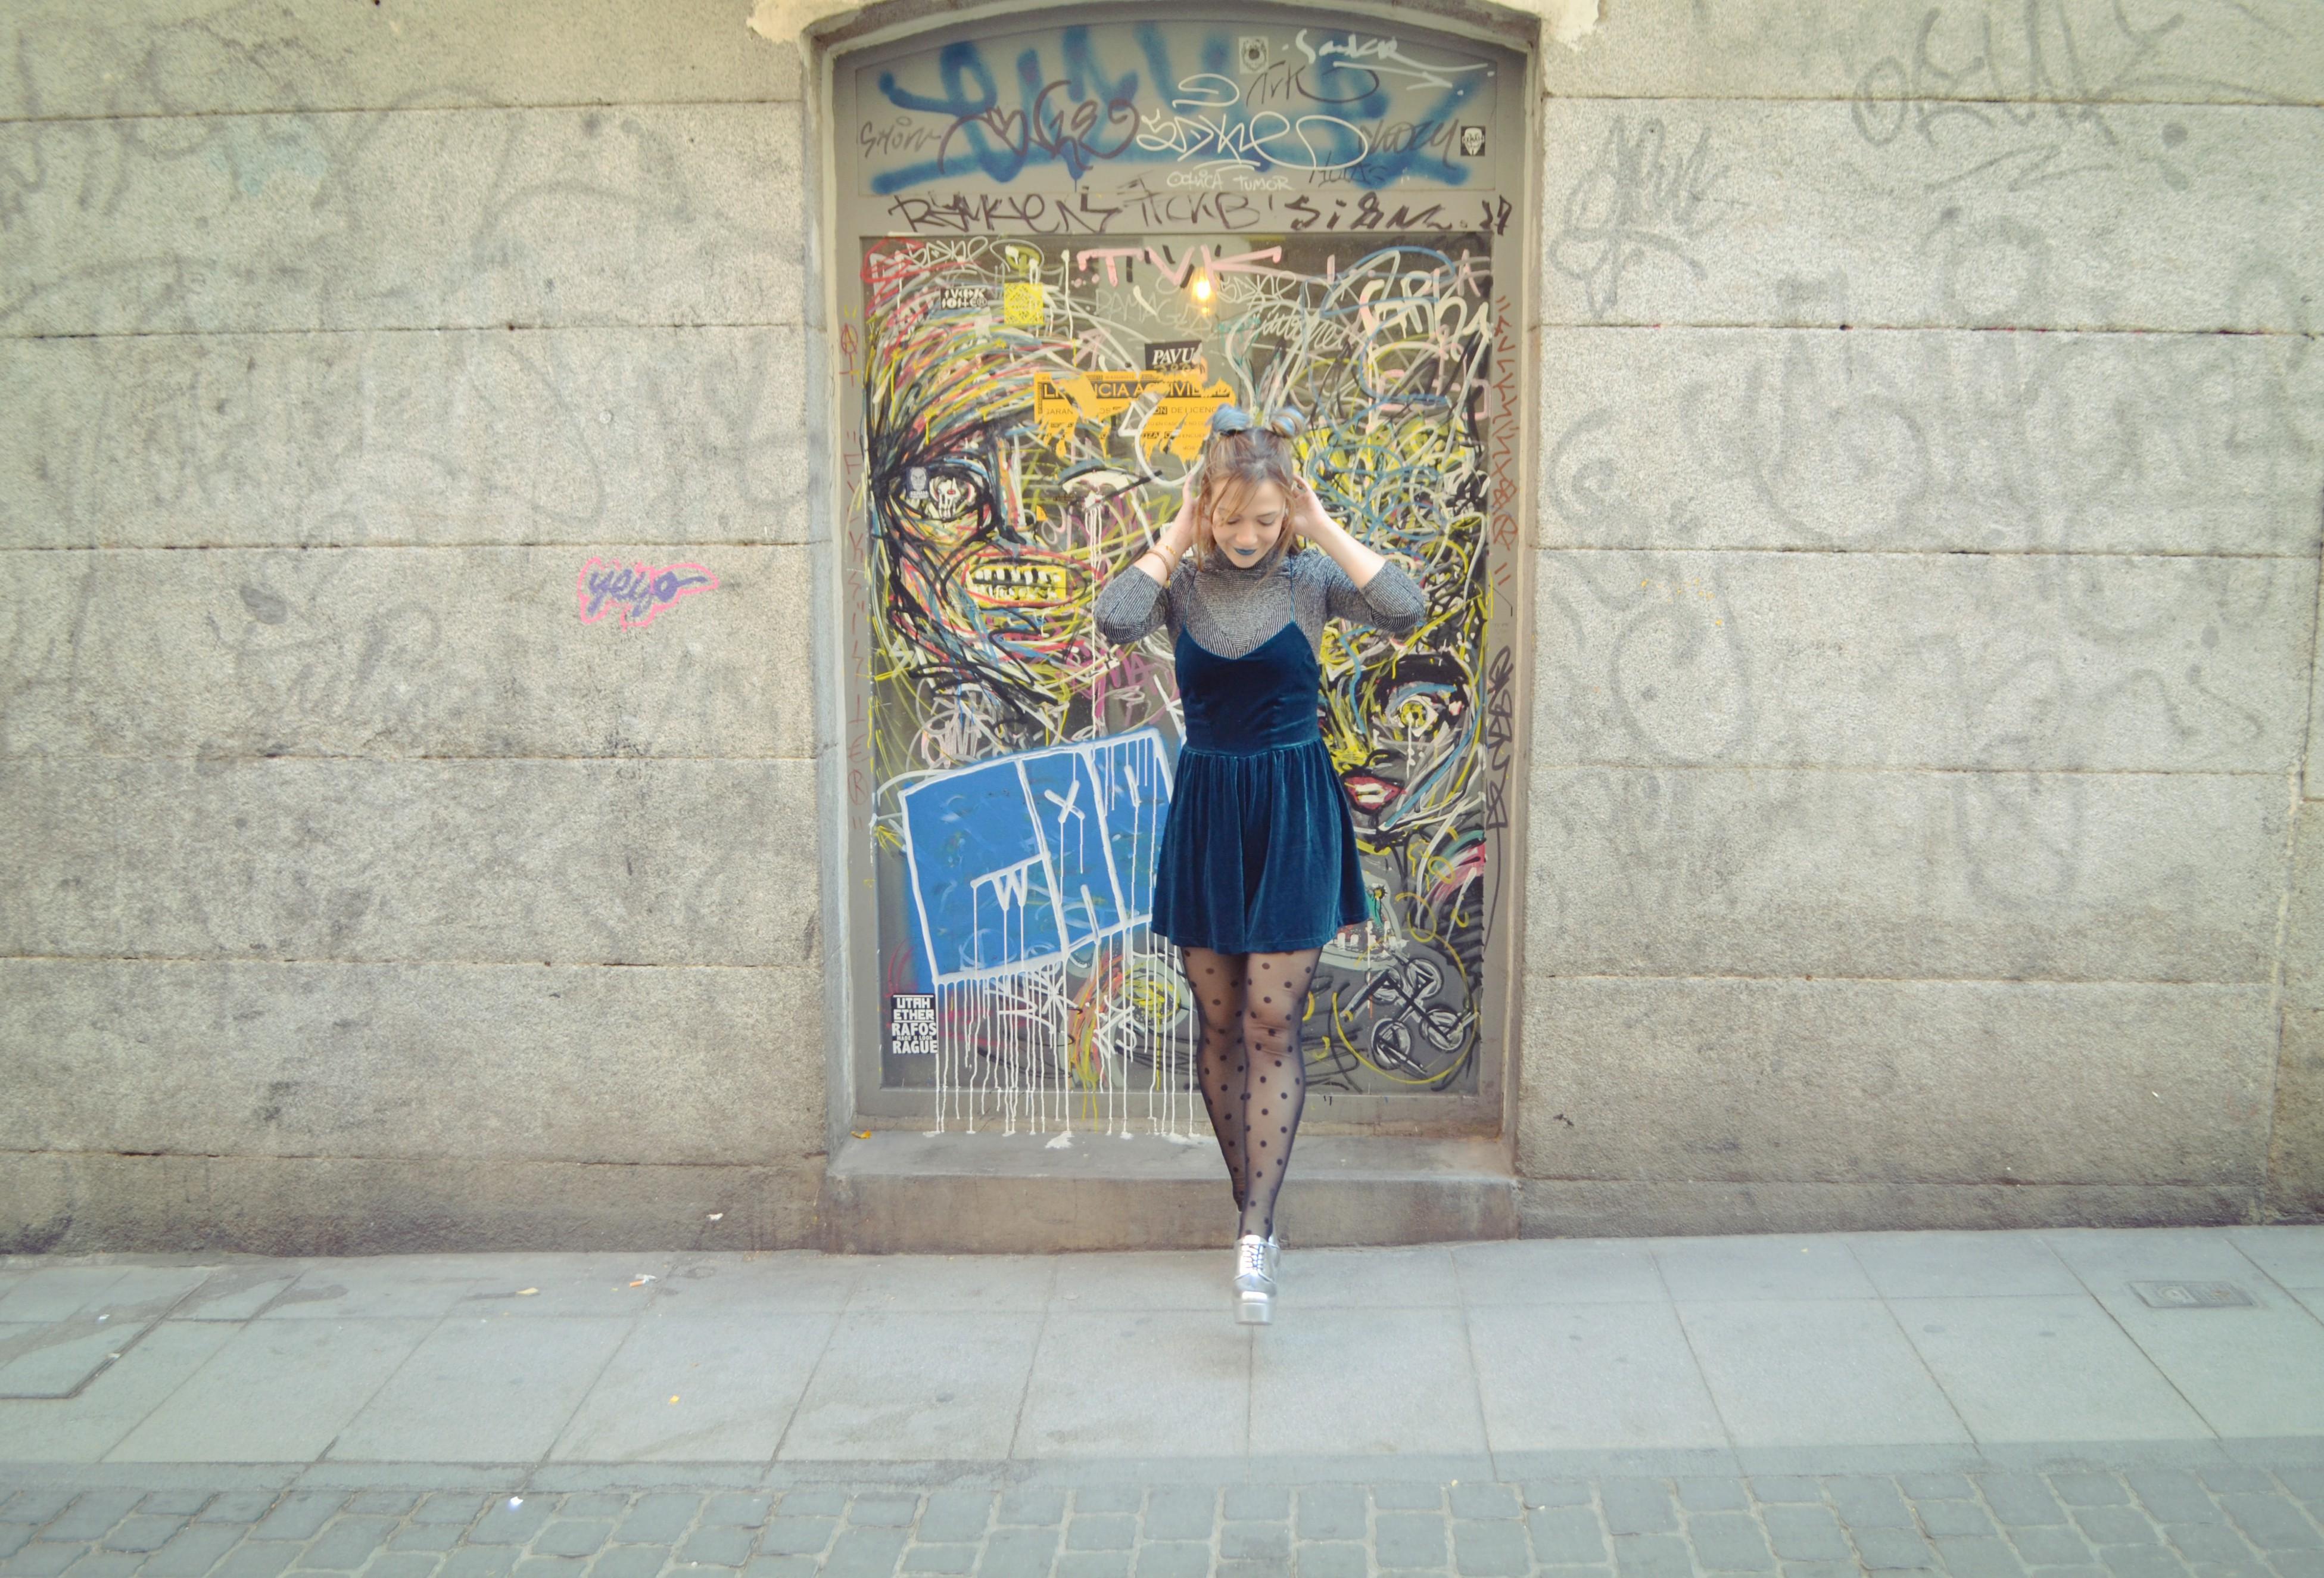 Blog-de-moda-velvet-look-Chic-Adicta-fashionista-Chic-Adicta-pelo-azul-90s-style-romwe-jumpsuit-PiensaenChic-Piensa-en-Chic